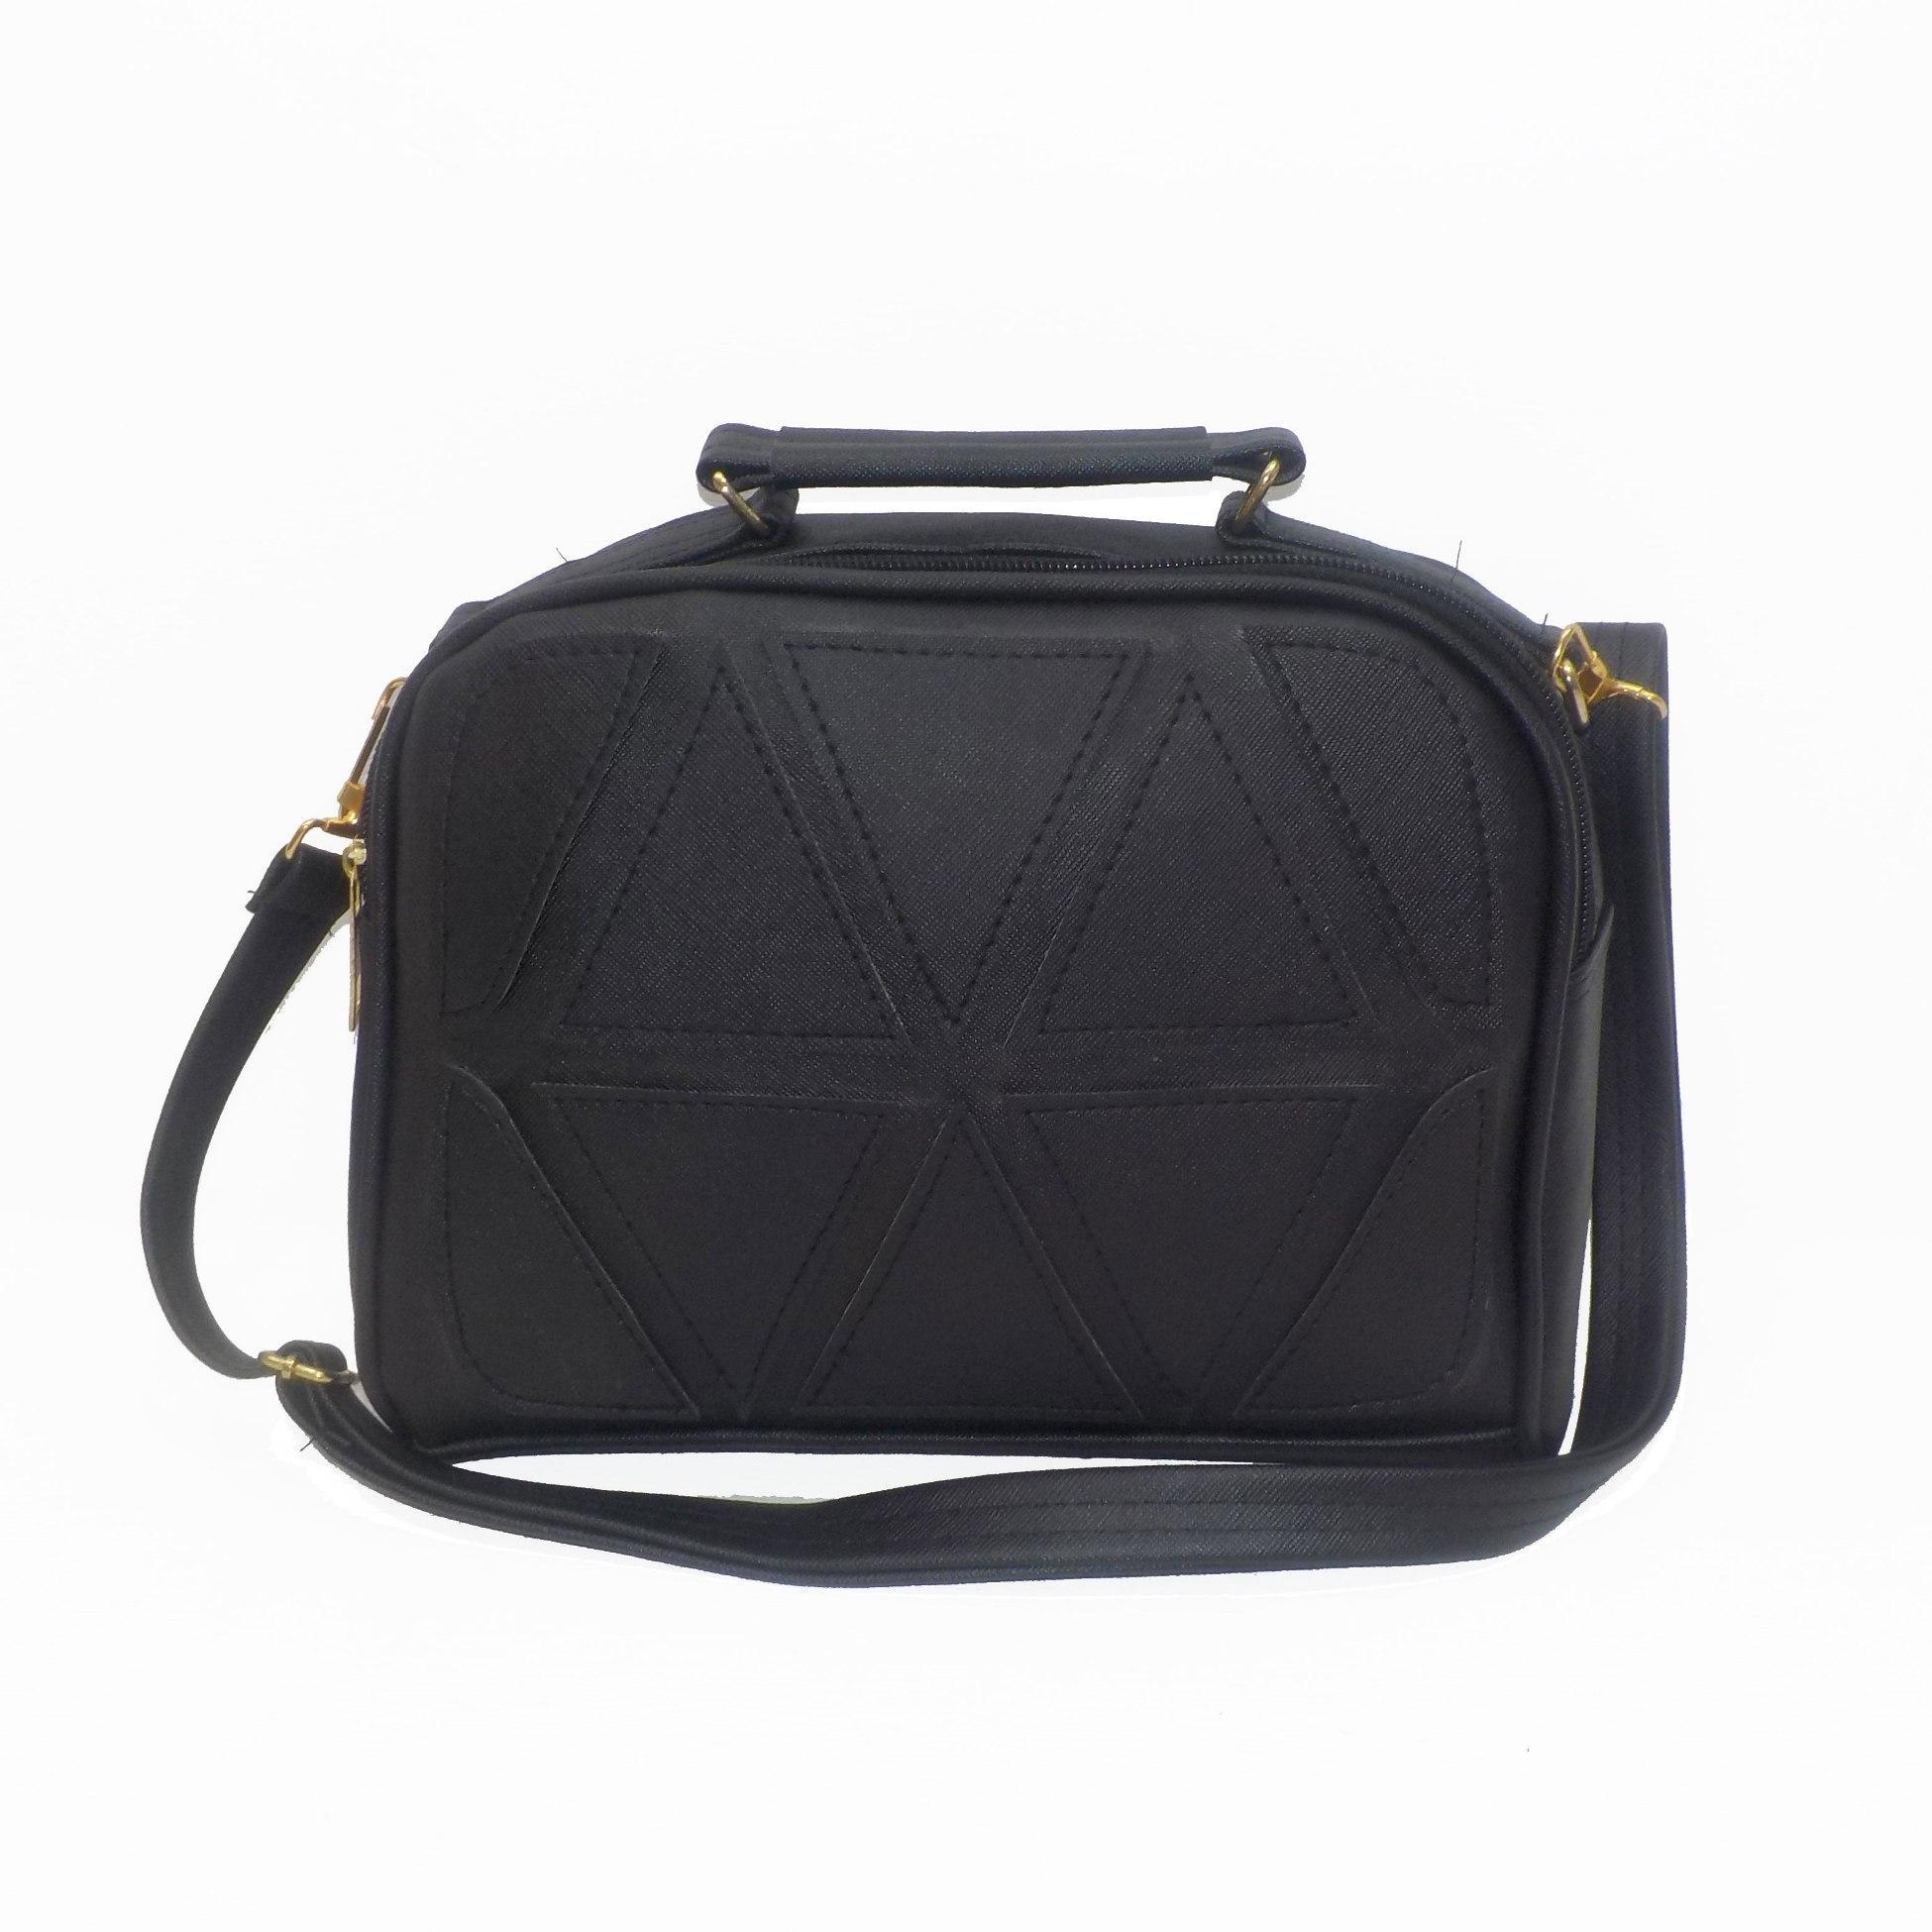 auris tas fashion selempang wanita 254057 [coklat]